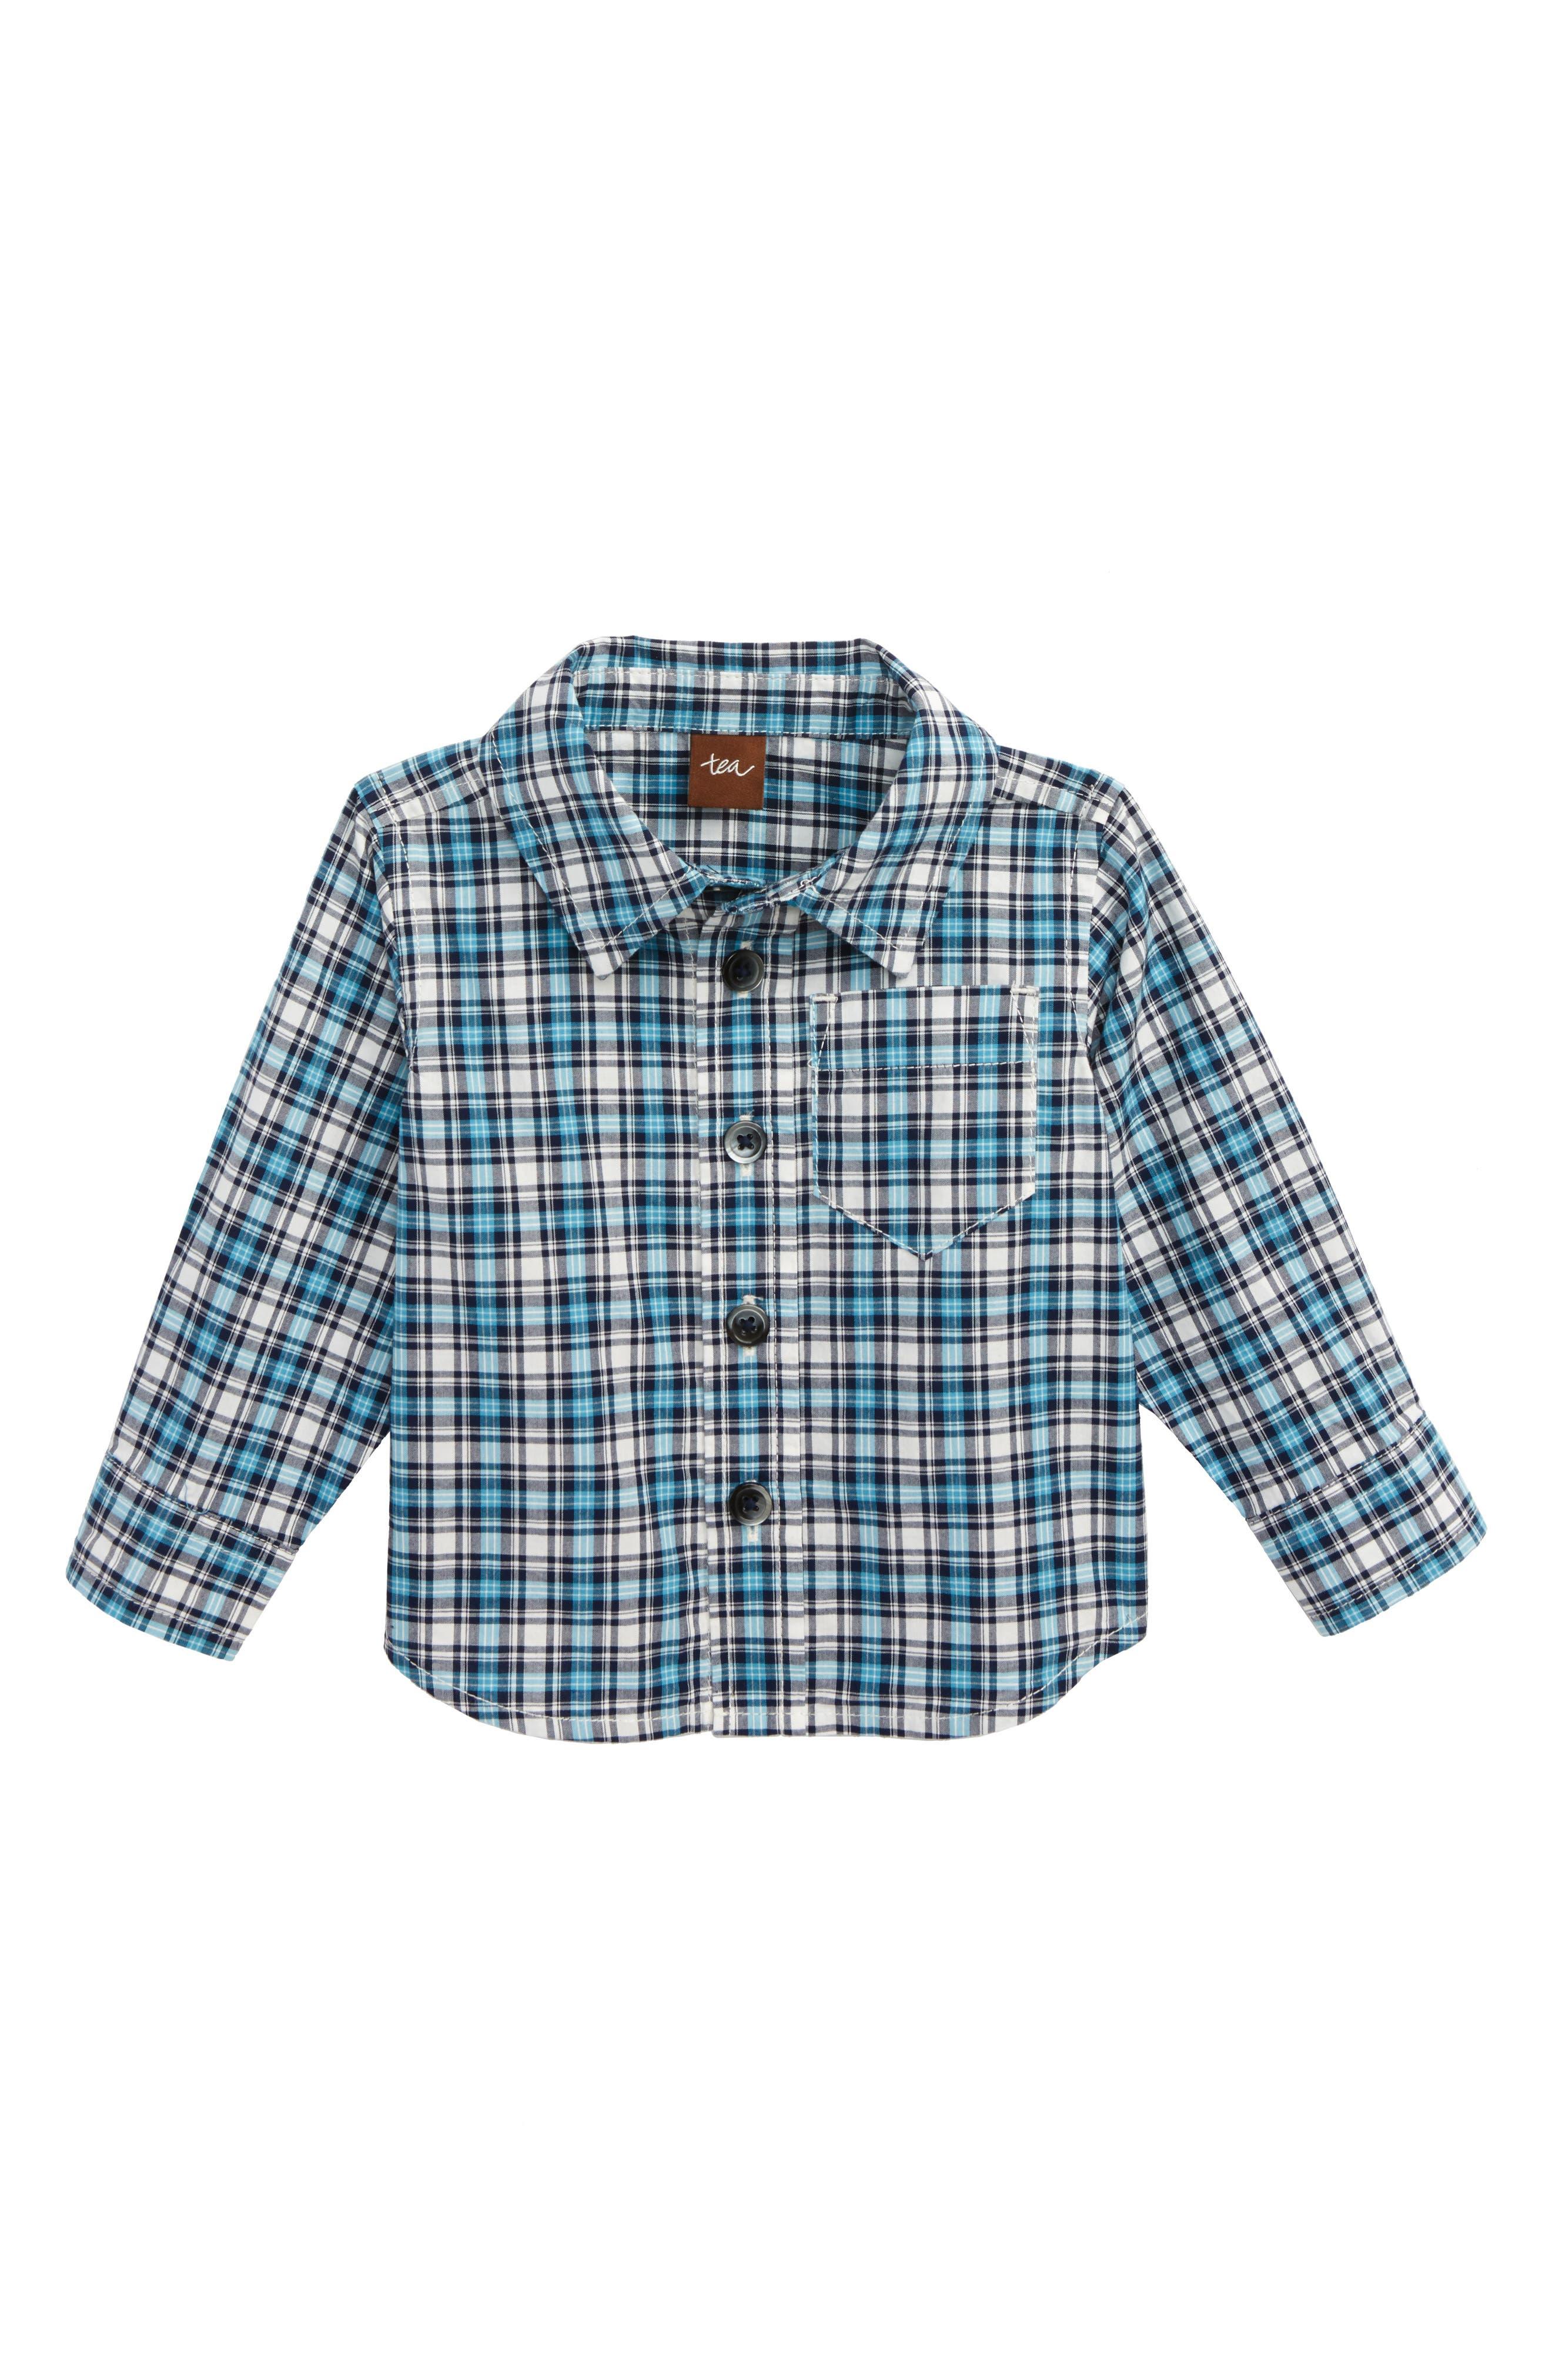 Heath Plaid Woven Shirt,                         Main,                         color,